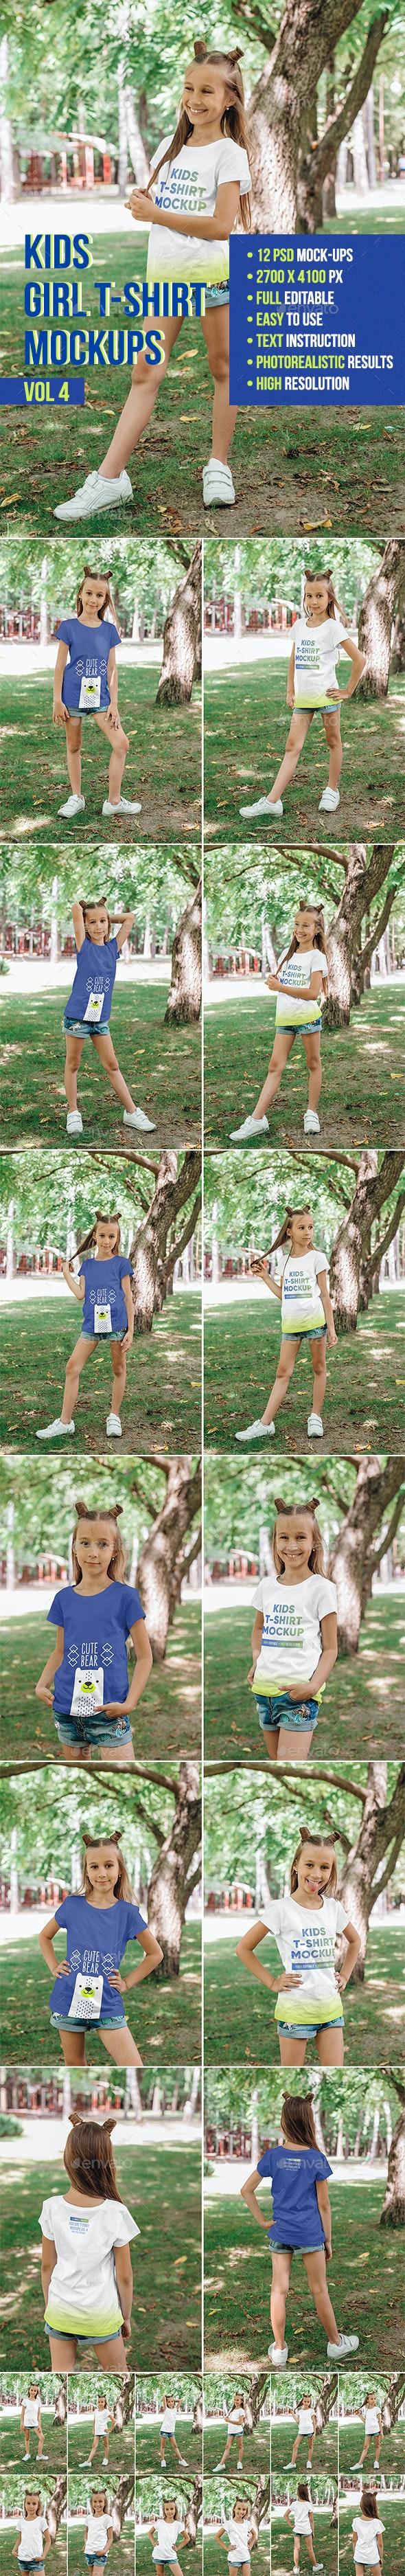 Kids Girl T-Shirt Mockups Vol 4 - T-shirts Apparel